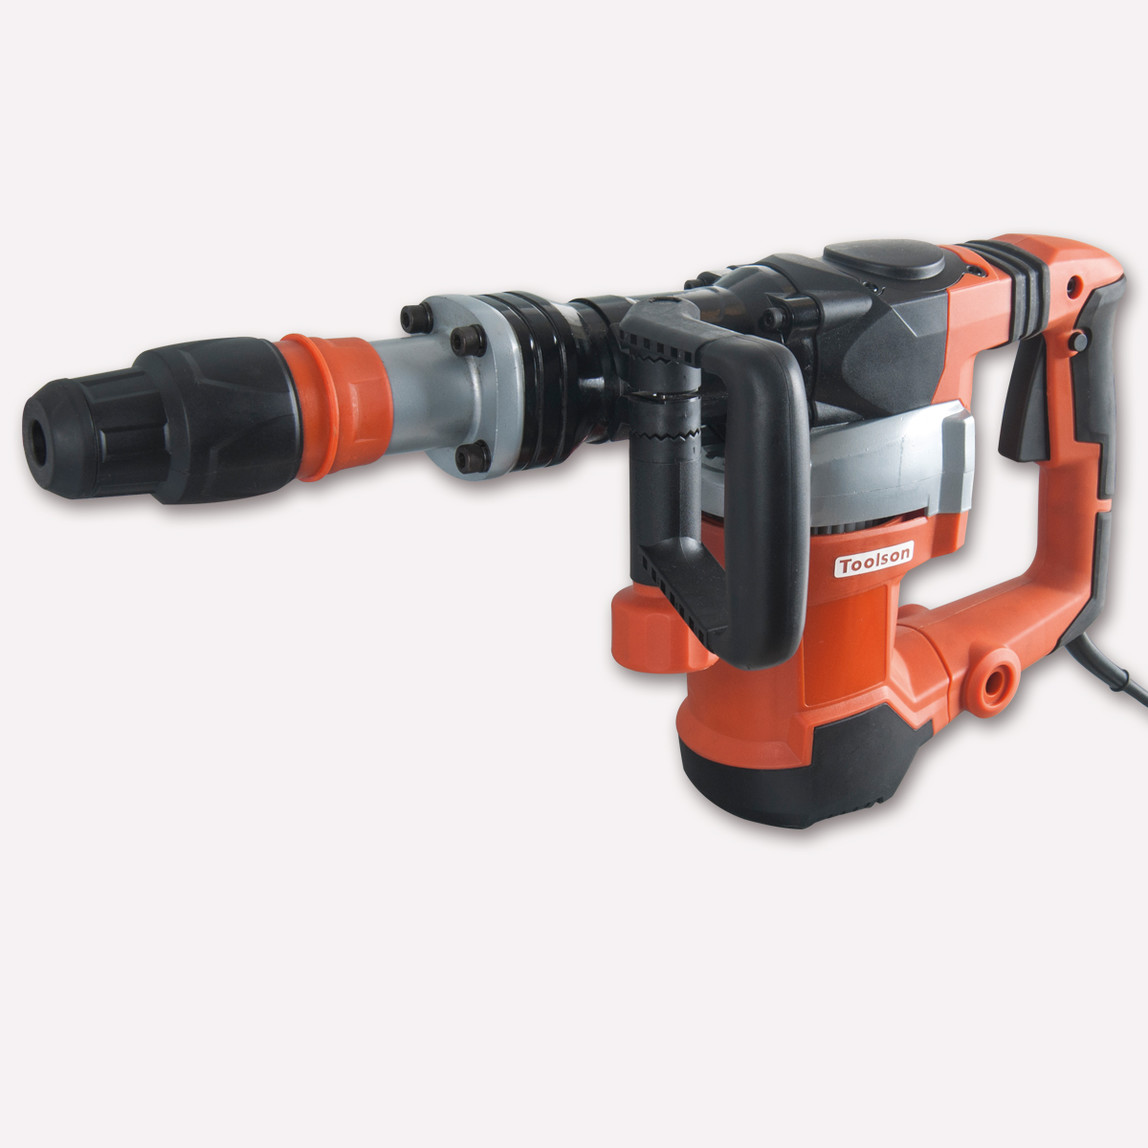 Toolson PRO-HM27 1500W SDS Max Kırıcı